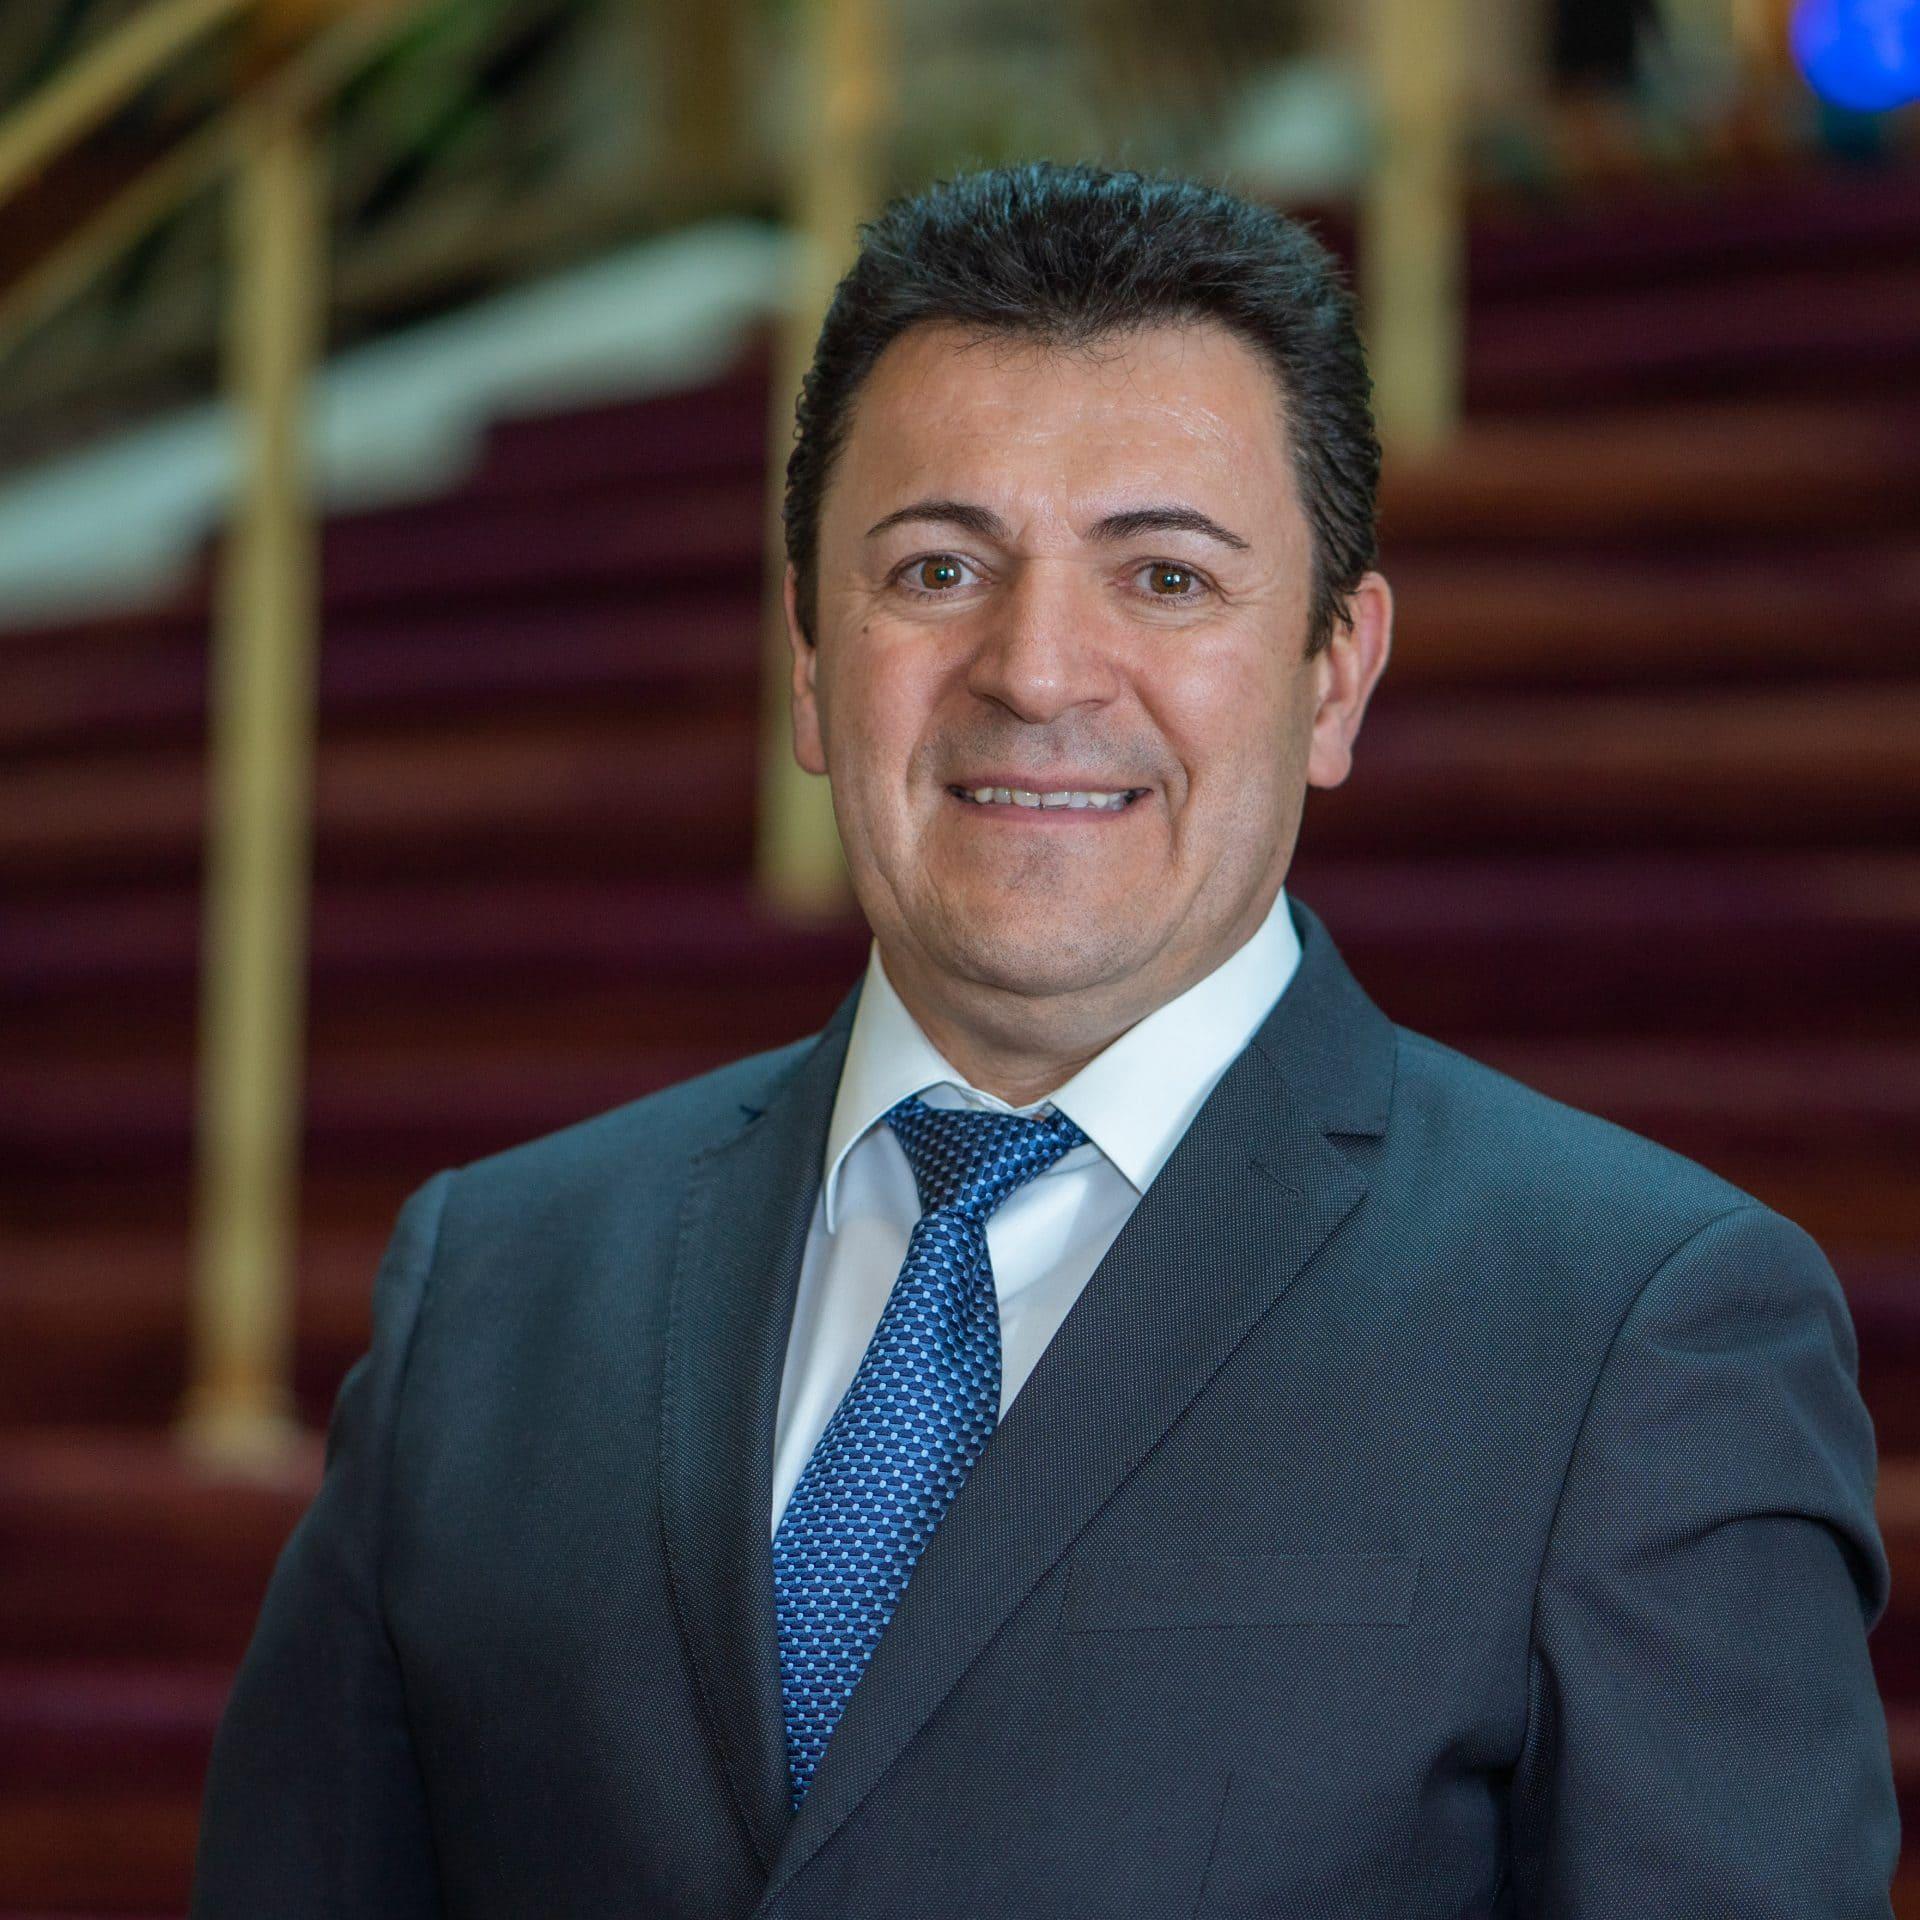 Balbino Poncelas